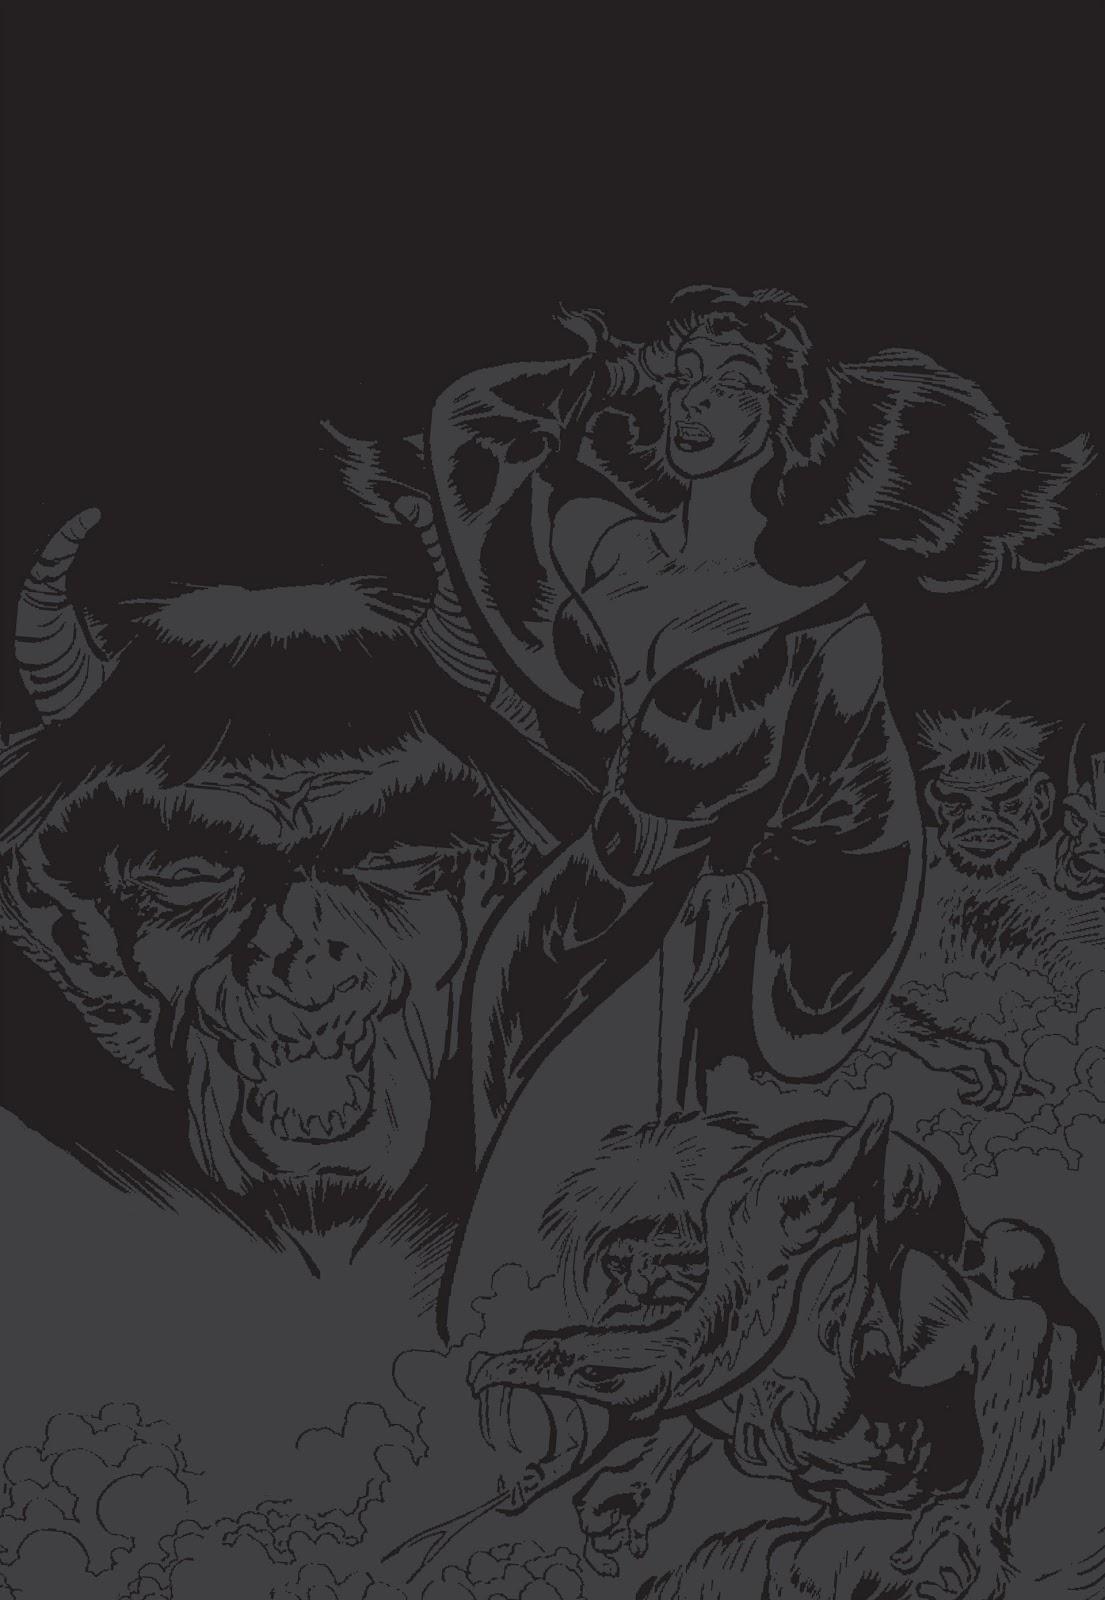 Read online The Joe Kubert Archives comic -  Issue # TPB (Part 1) - 11